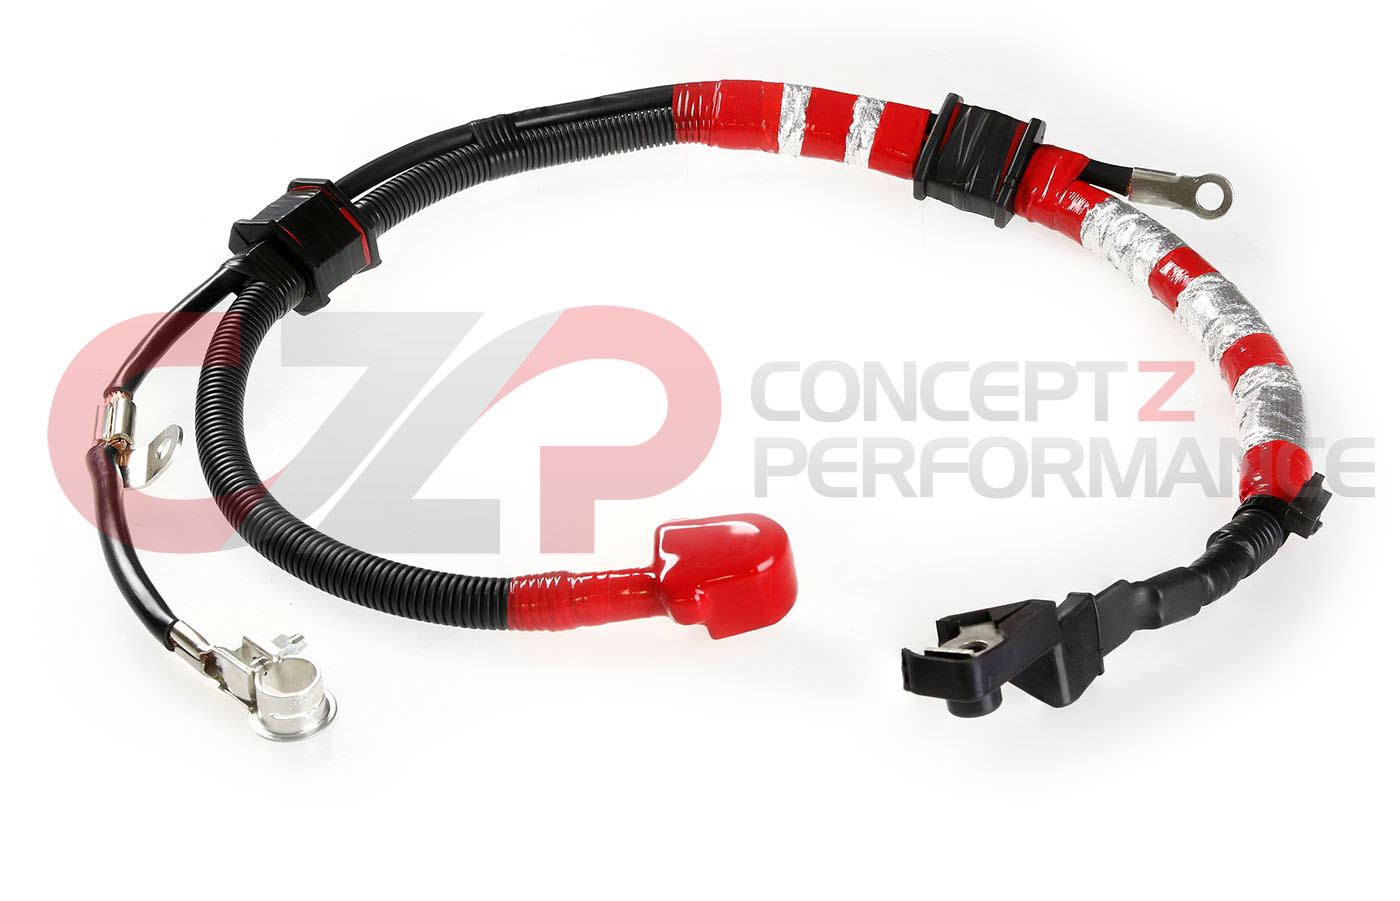 2008 nissan altima alternator wiring diagram fender elite stratocaster battery harness get free image